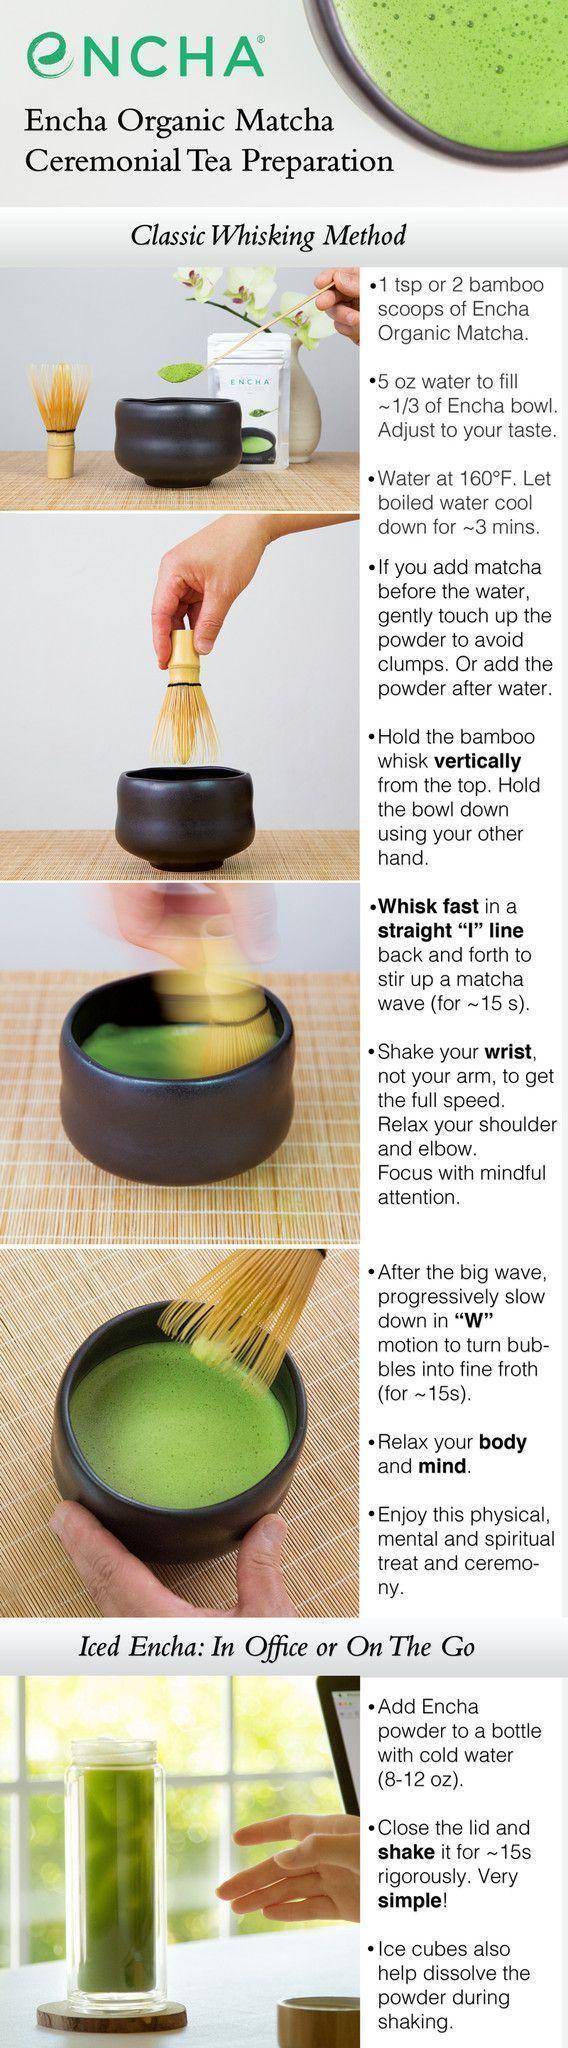 How to whisk matcha tea with Encha ceremonial organic #matcha #sugardetox